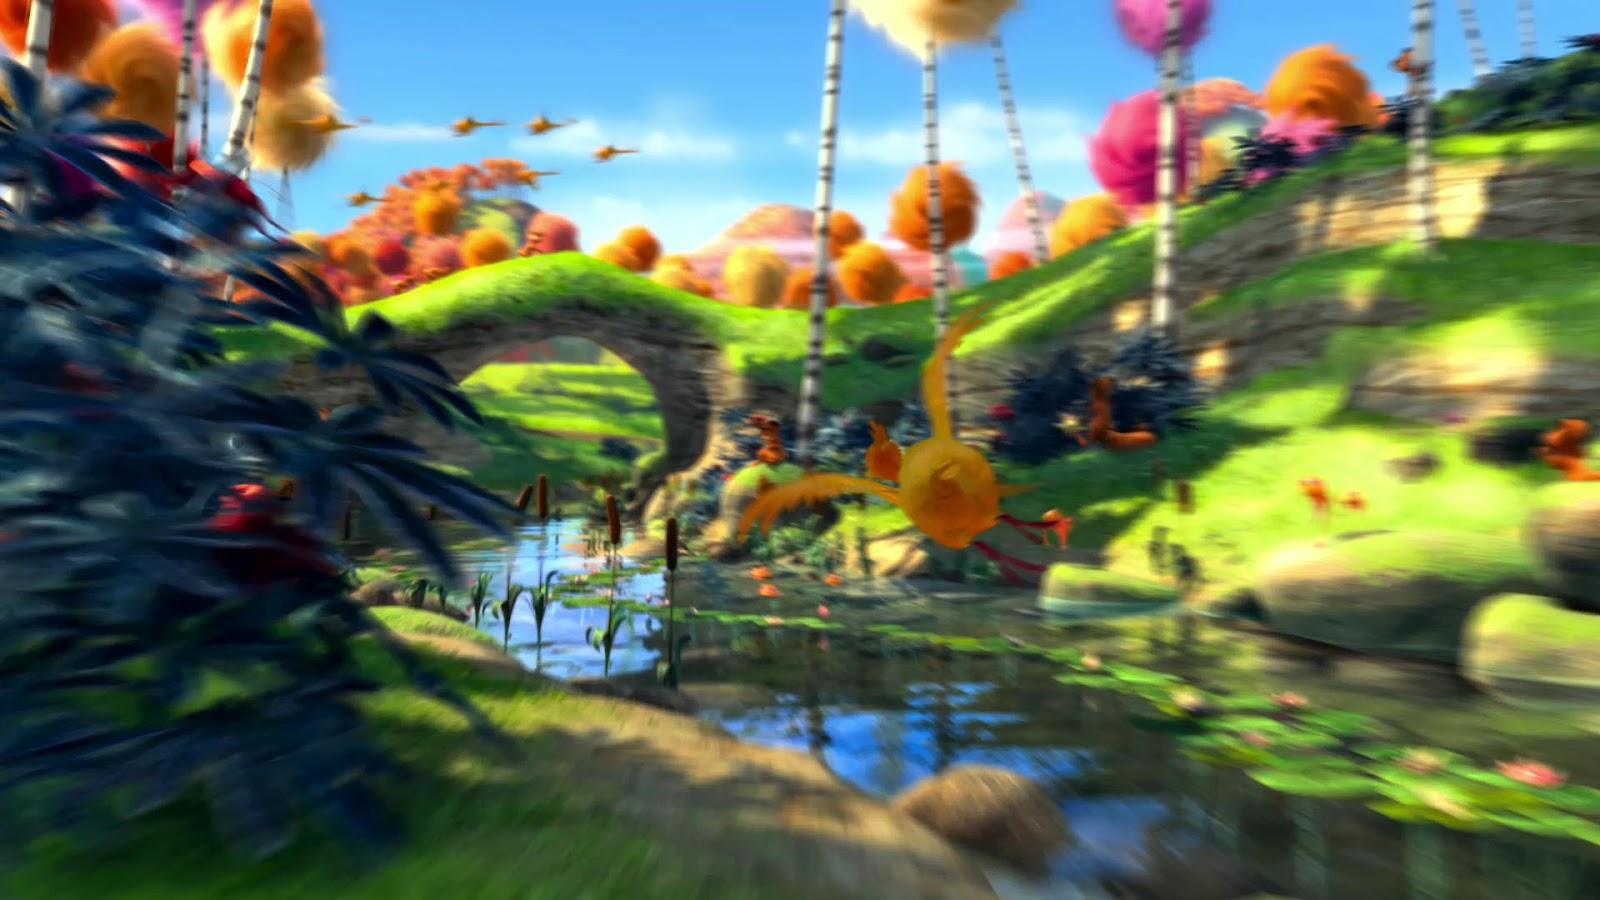 The lorax   Cartoon Movie Wallpaper 2 Cartoon Wallpaper 1600x900